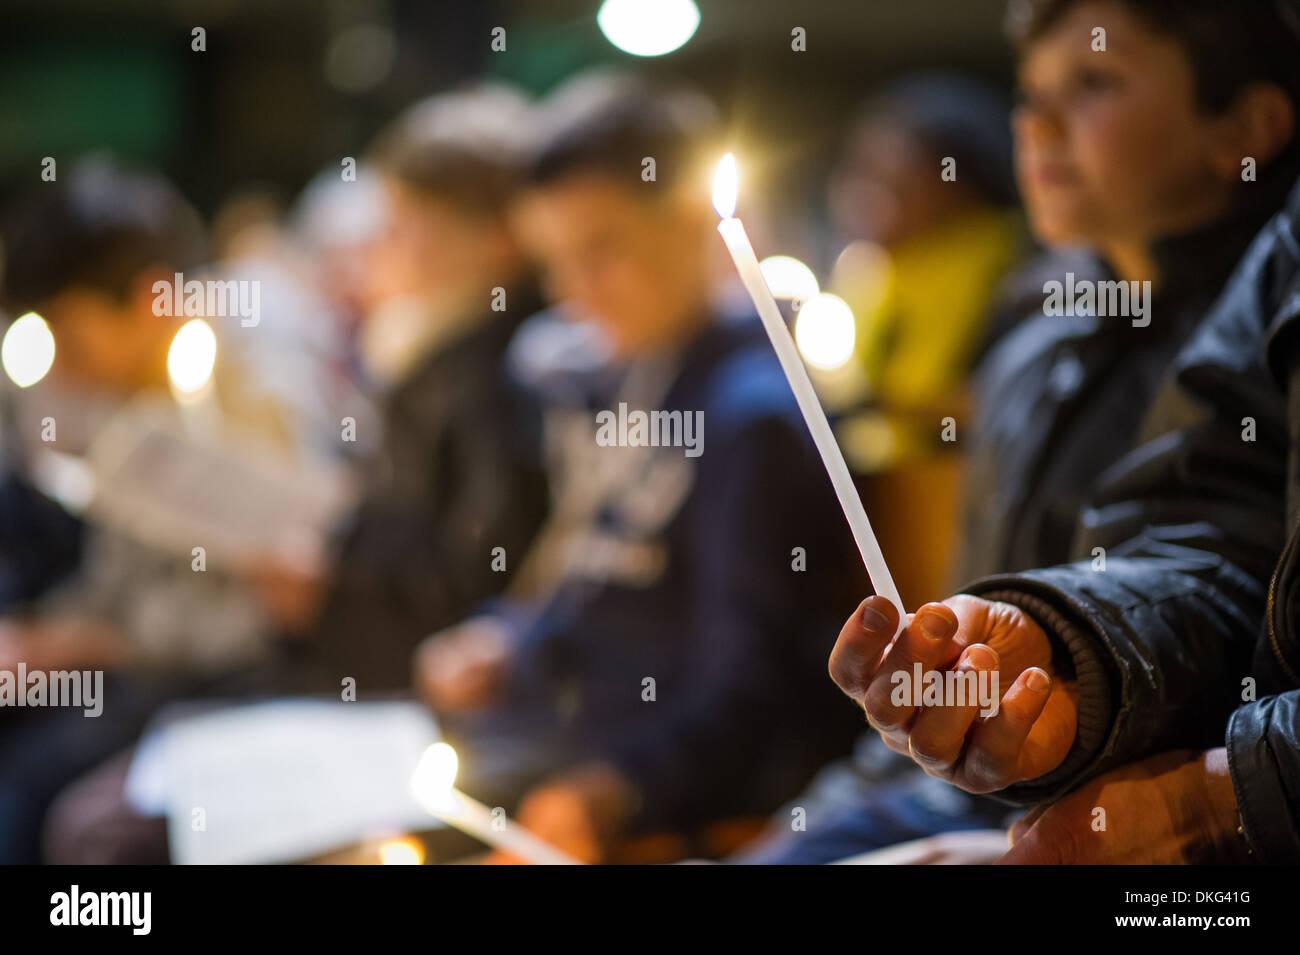 Vigil on Holy Saturday of Holy Week, Paris, France, Europe - Stock Image